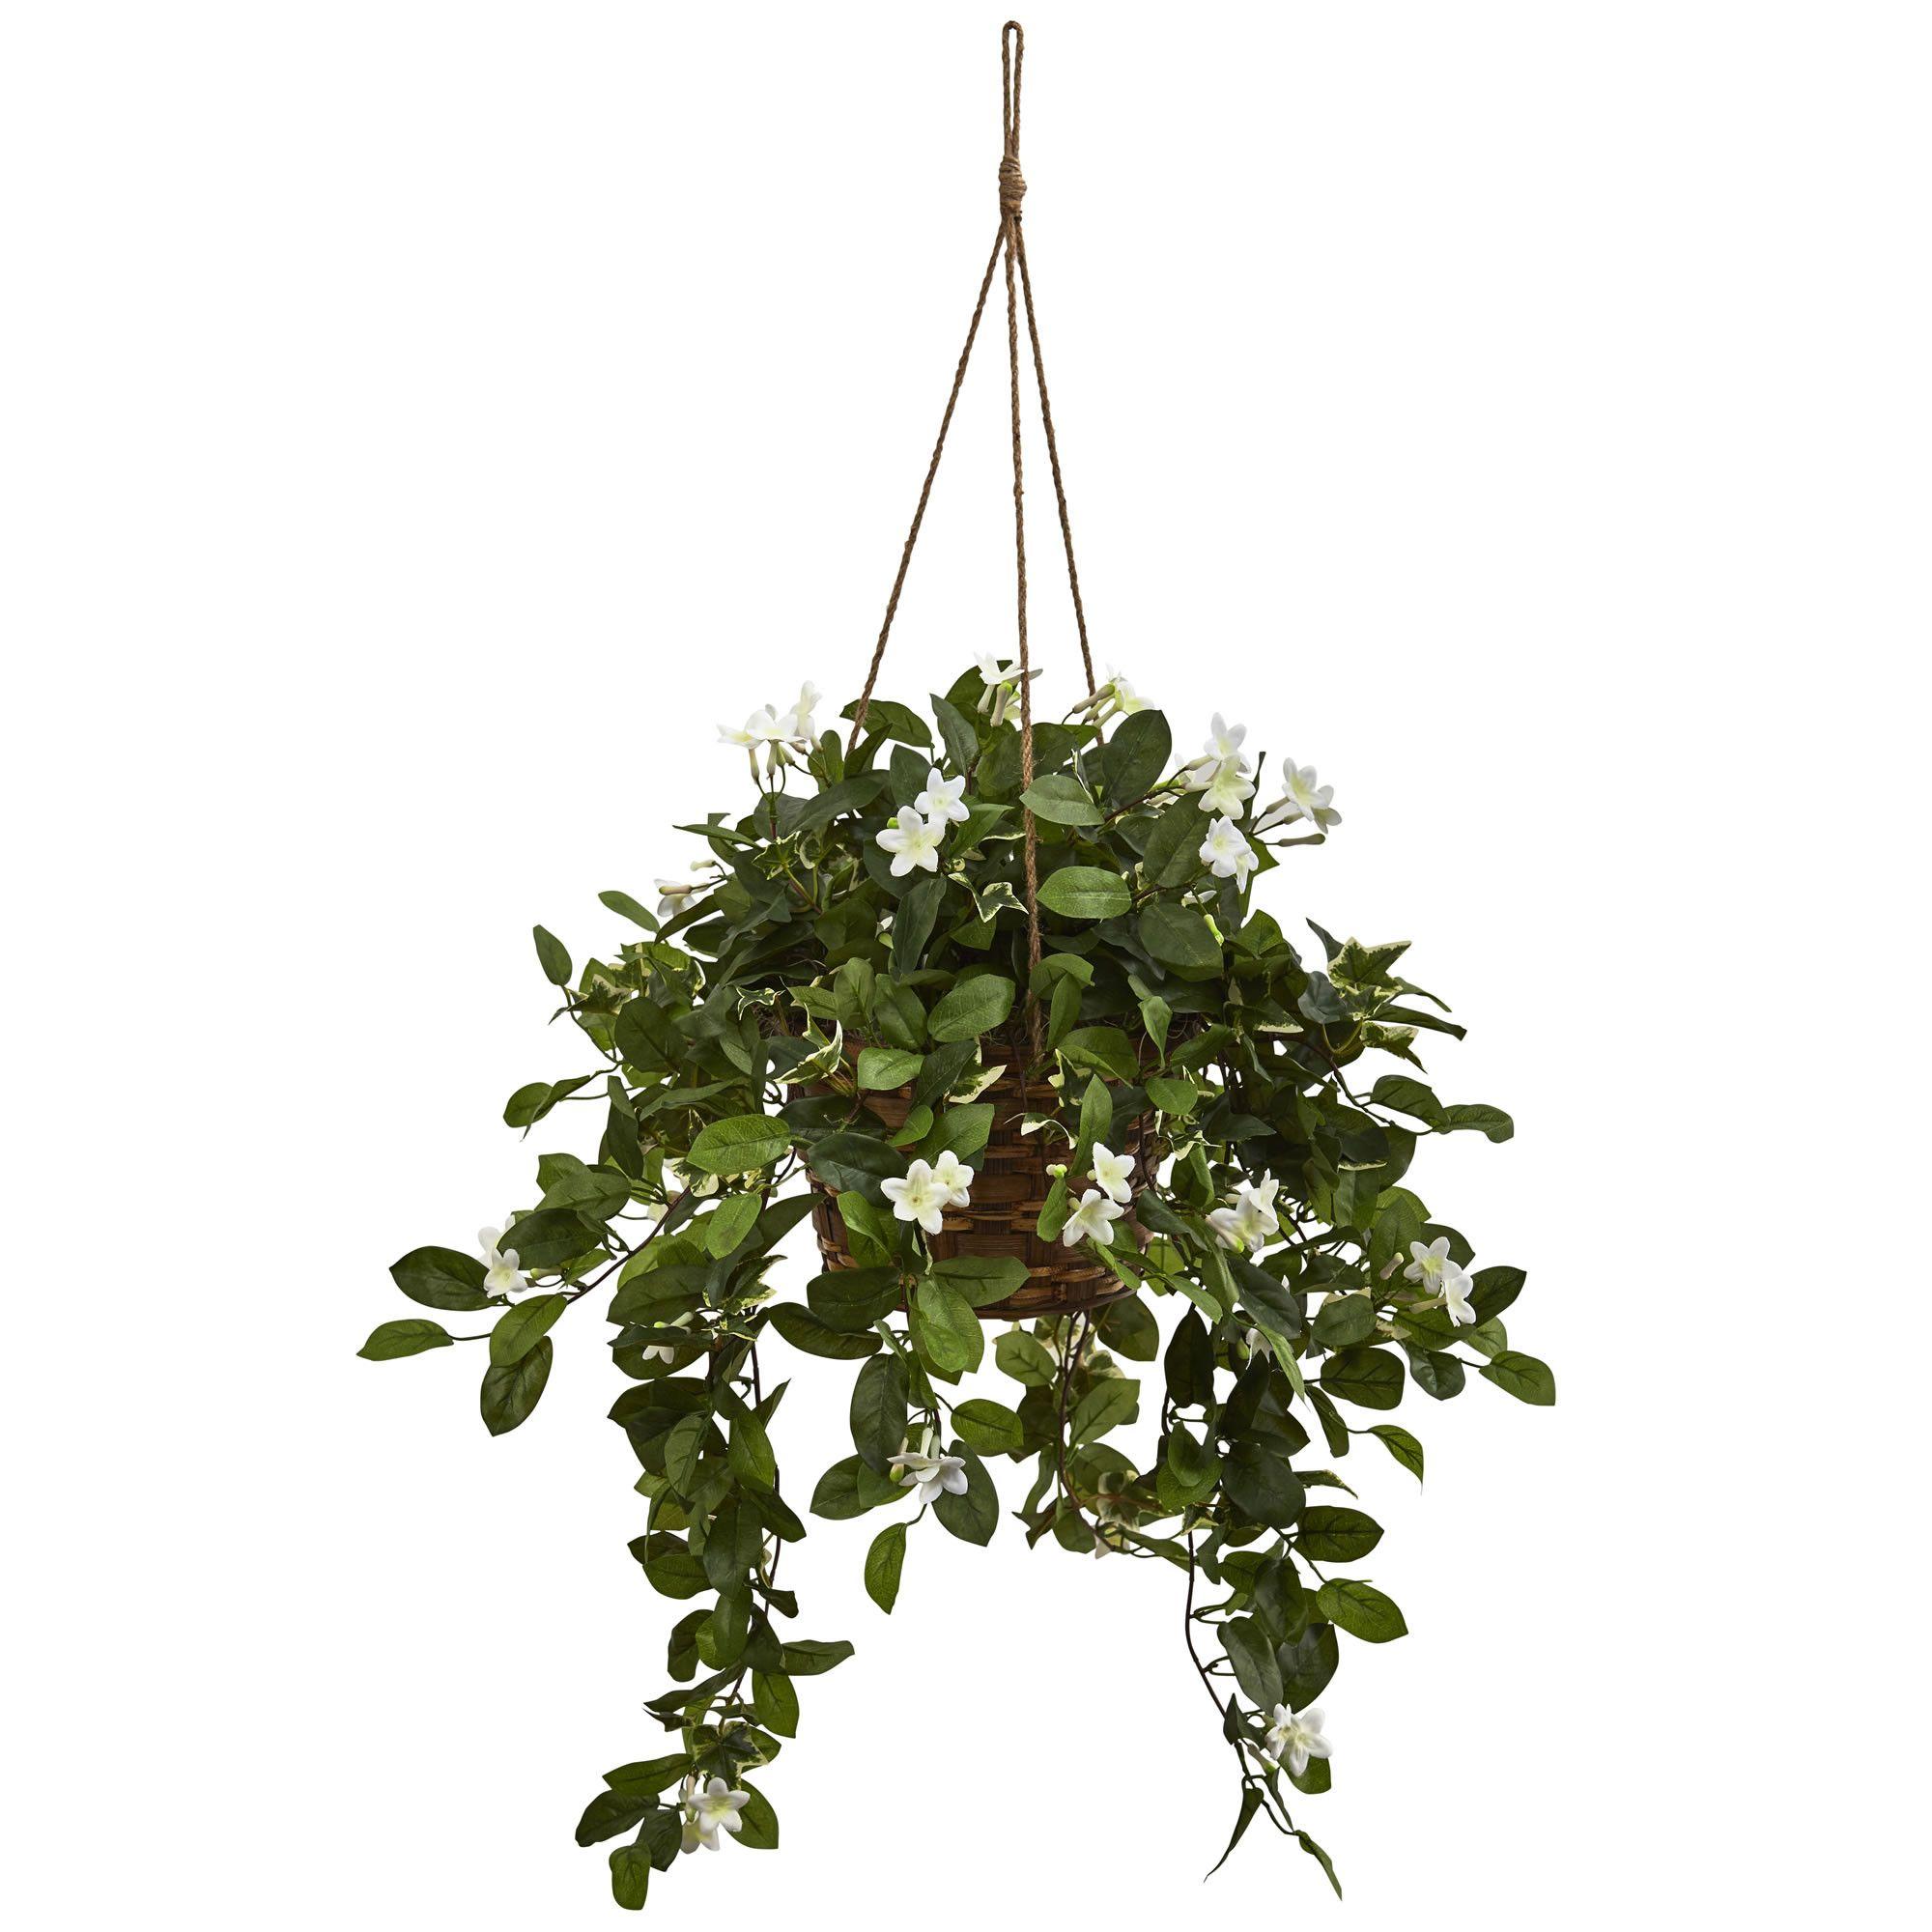 Mixed Stephanotis Hanging Plant in Basket